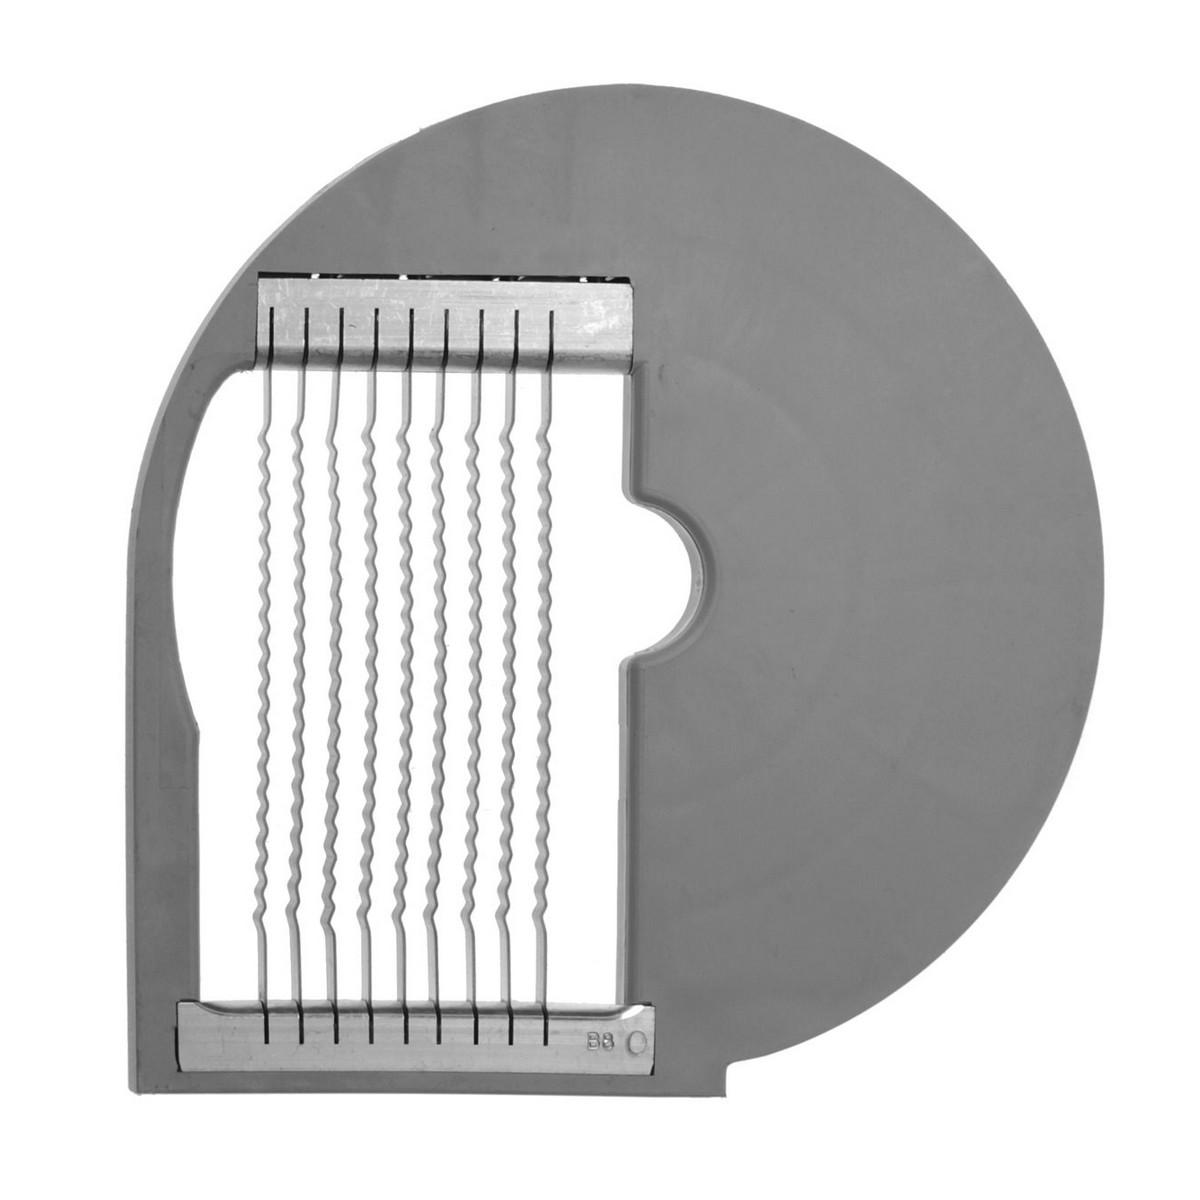 B8o Serie AK Disc - Für alle CHEF-Modelle 300-400